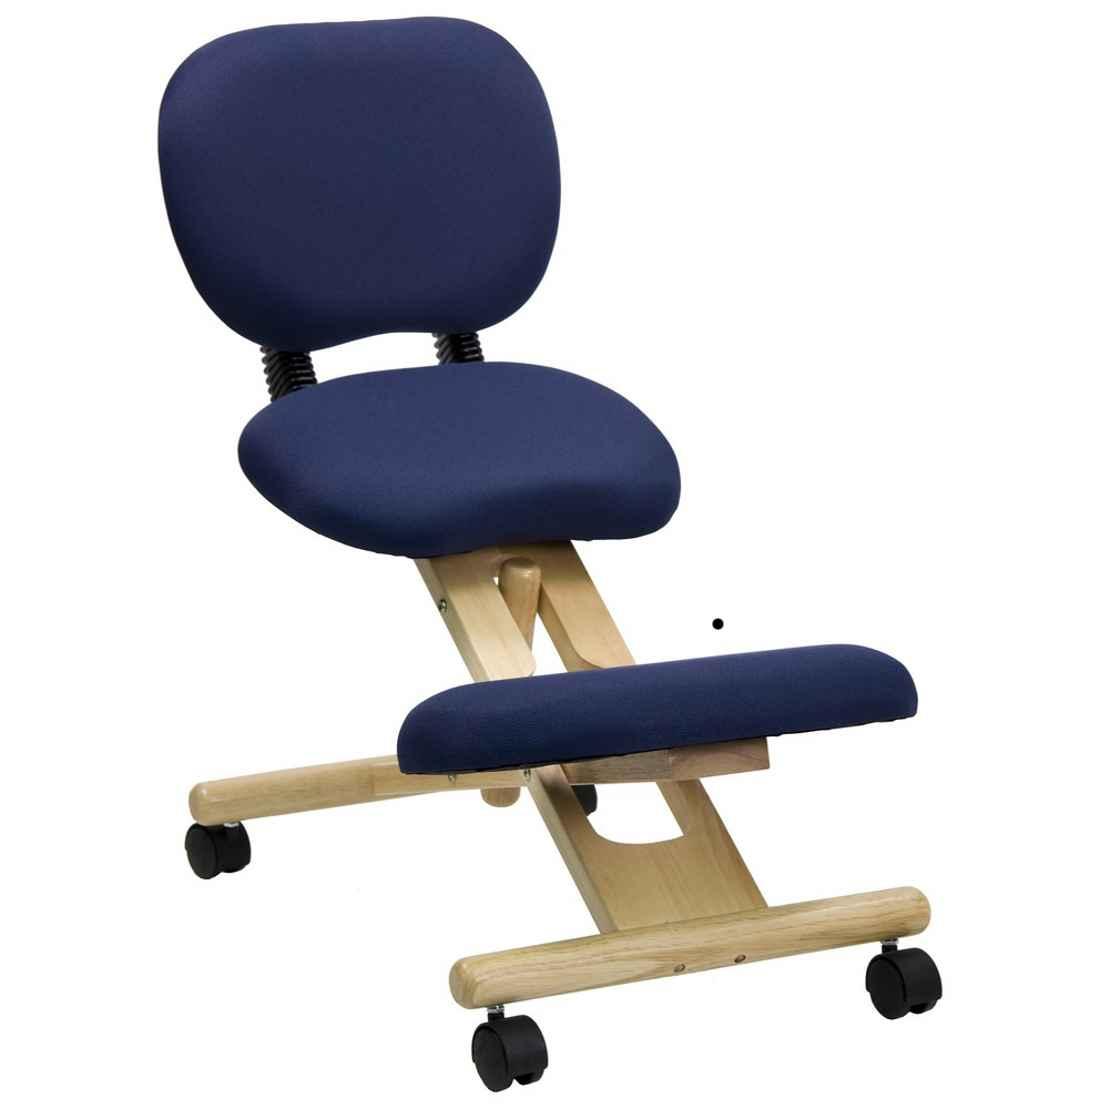 Kneeling Office Chairs Benefits